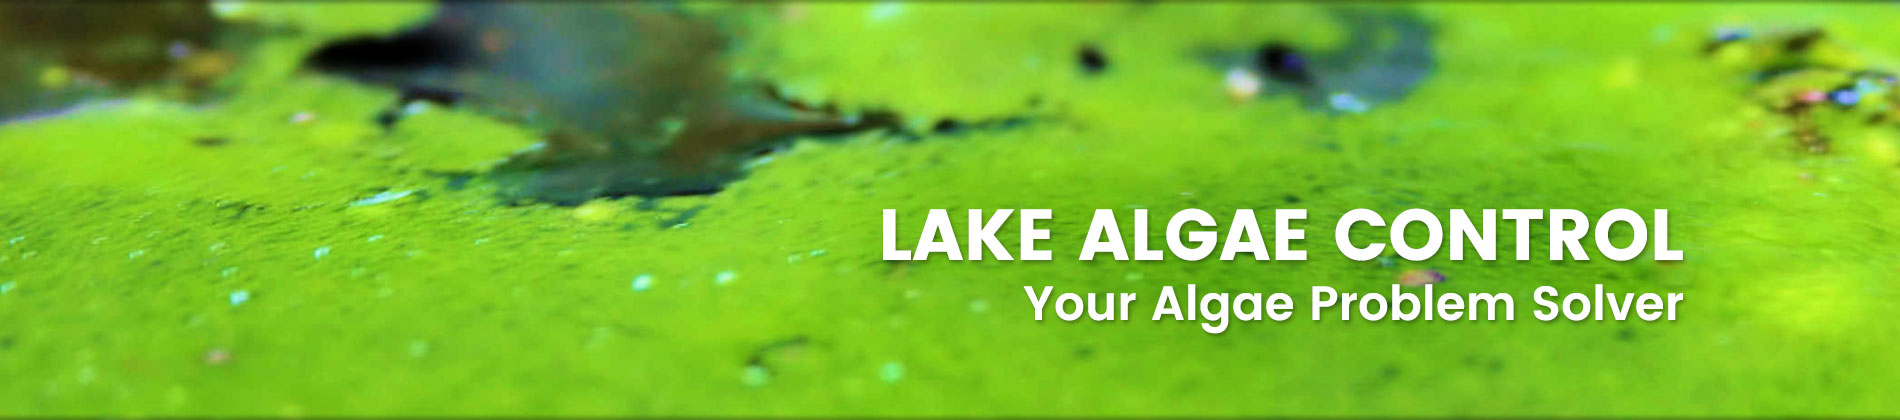 Lake Algae Control